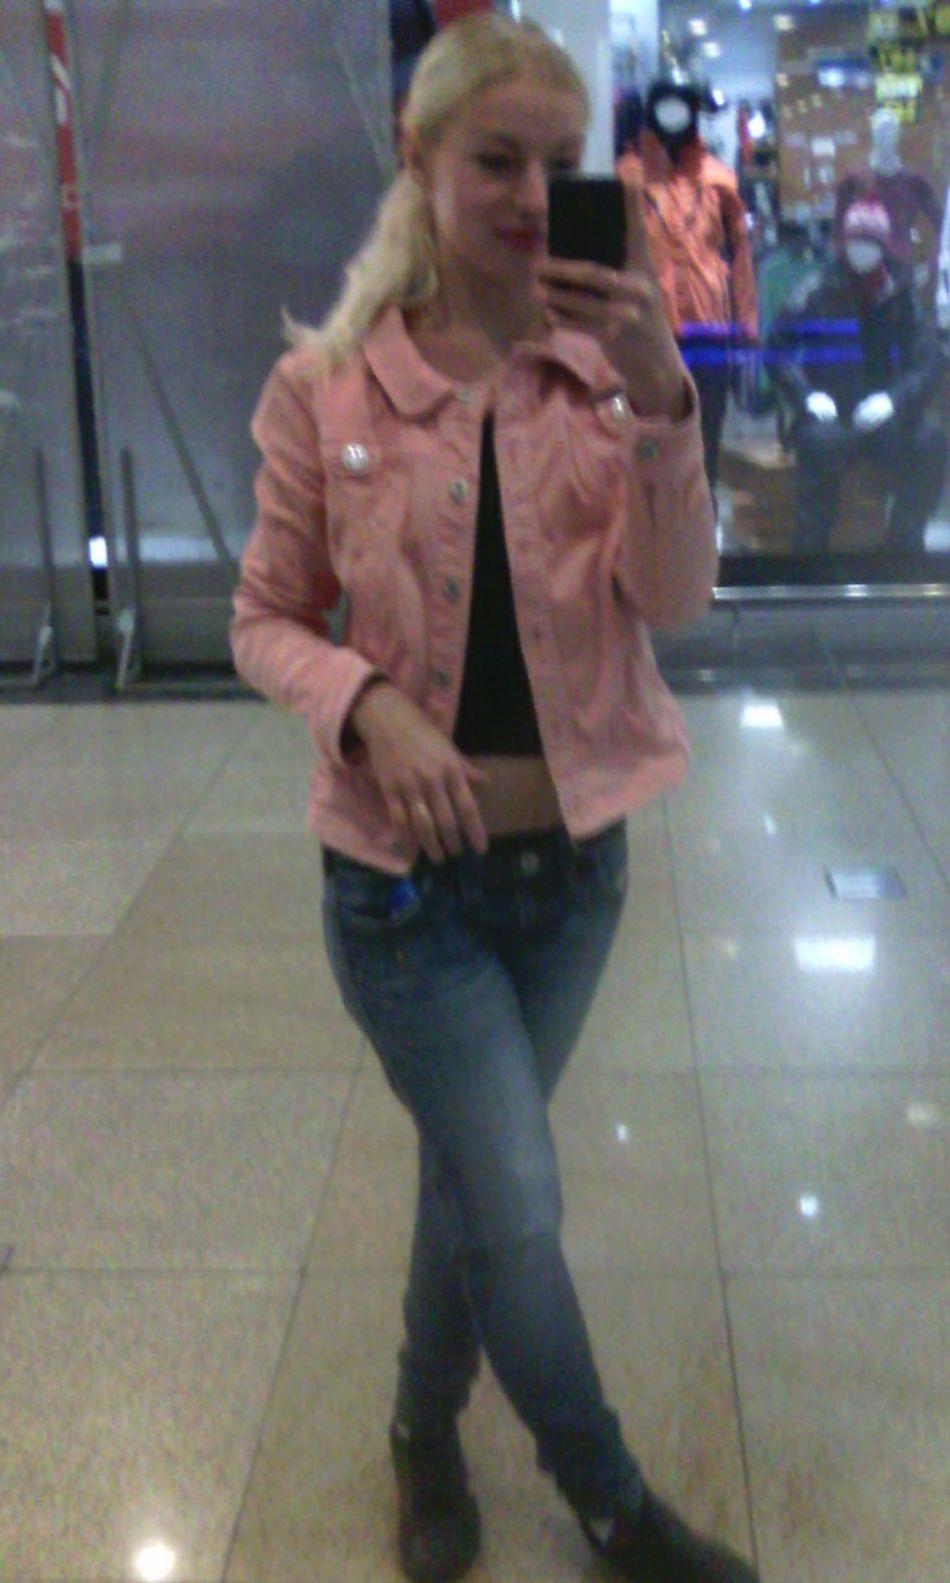 Karavan Like That's Me Beautiful Girl Good Times $$$ Baby Kharkov My Self